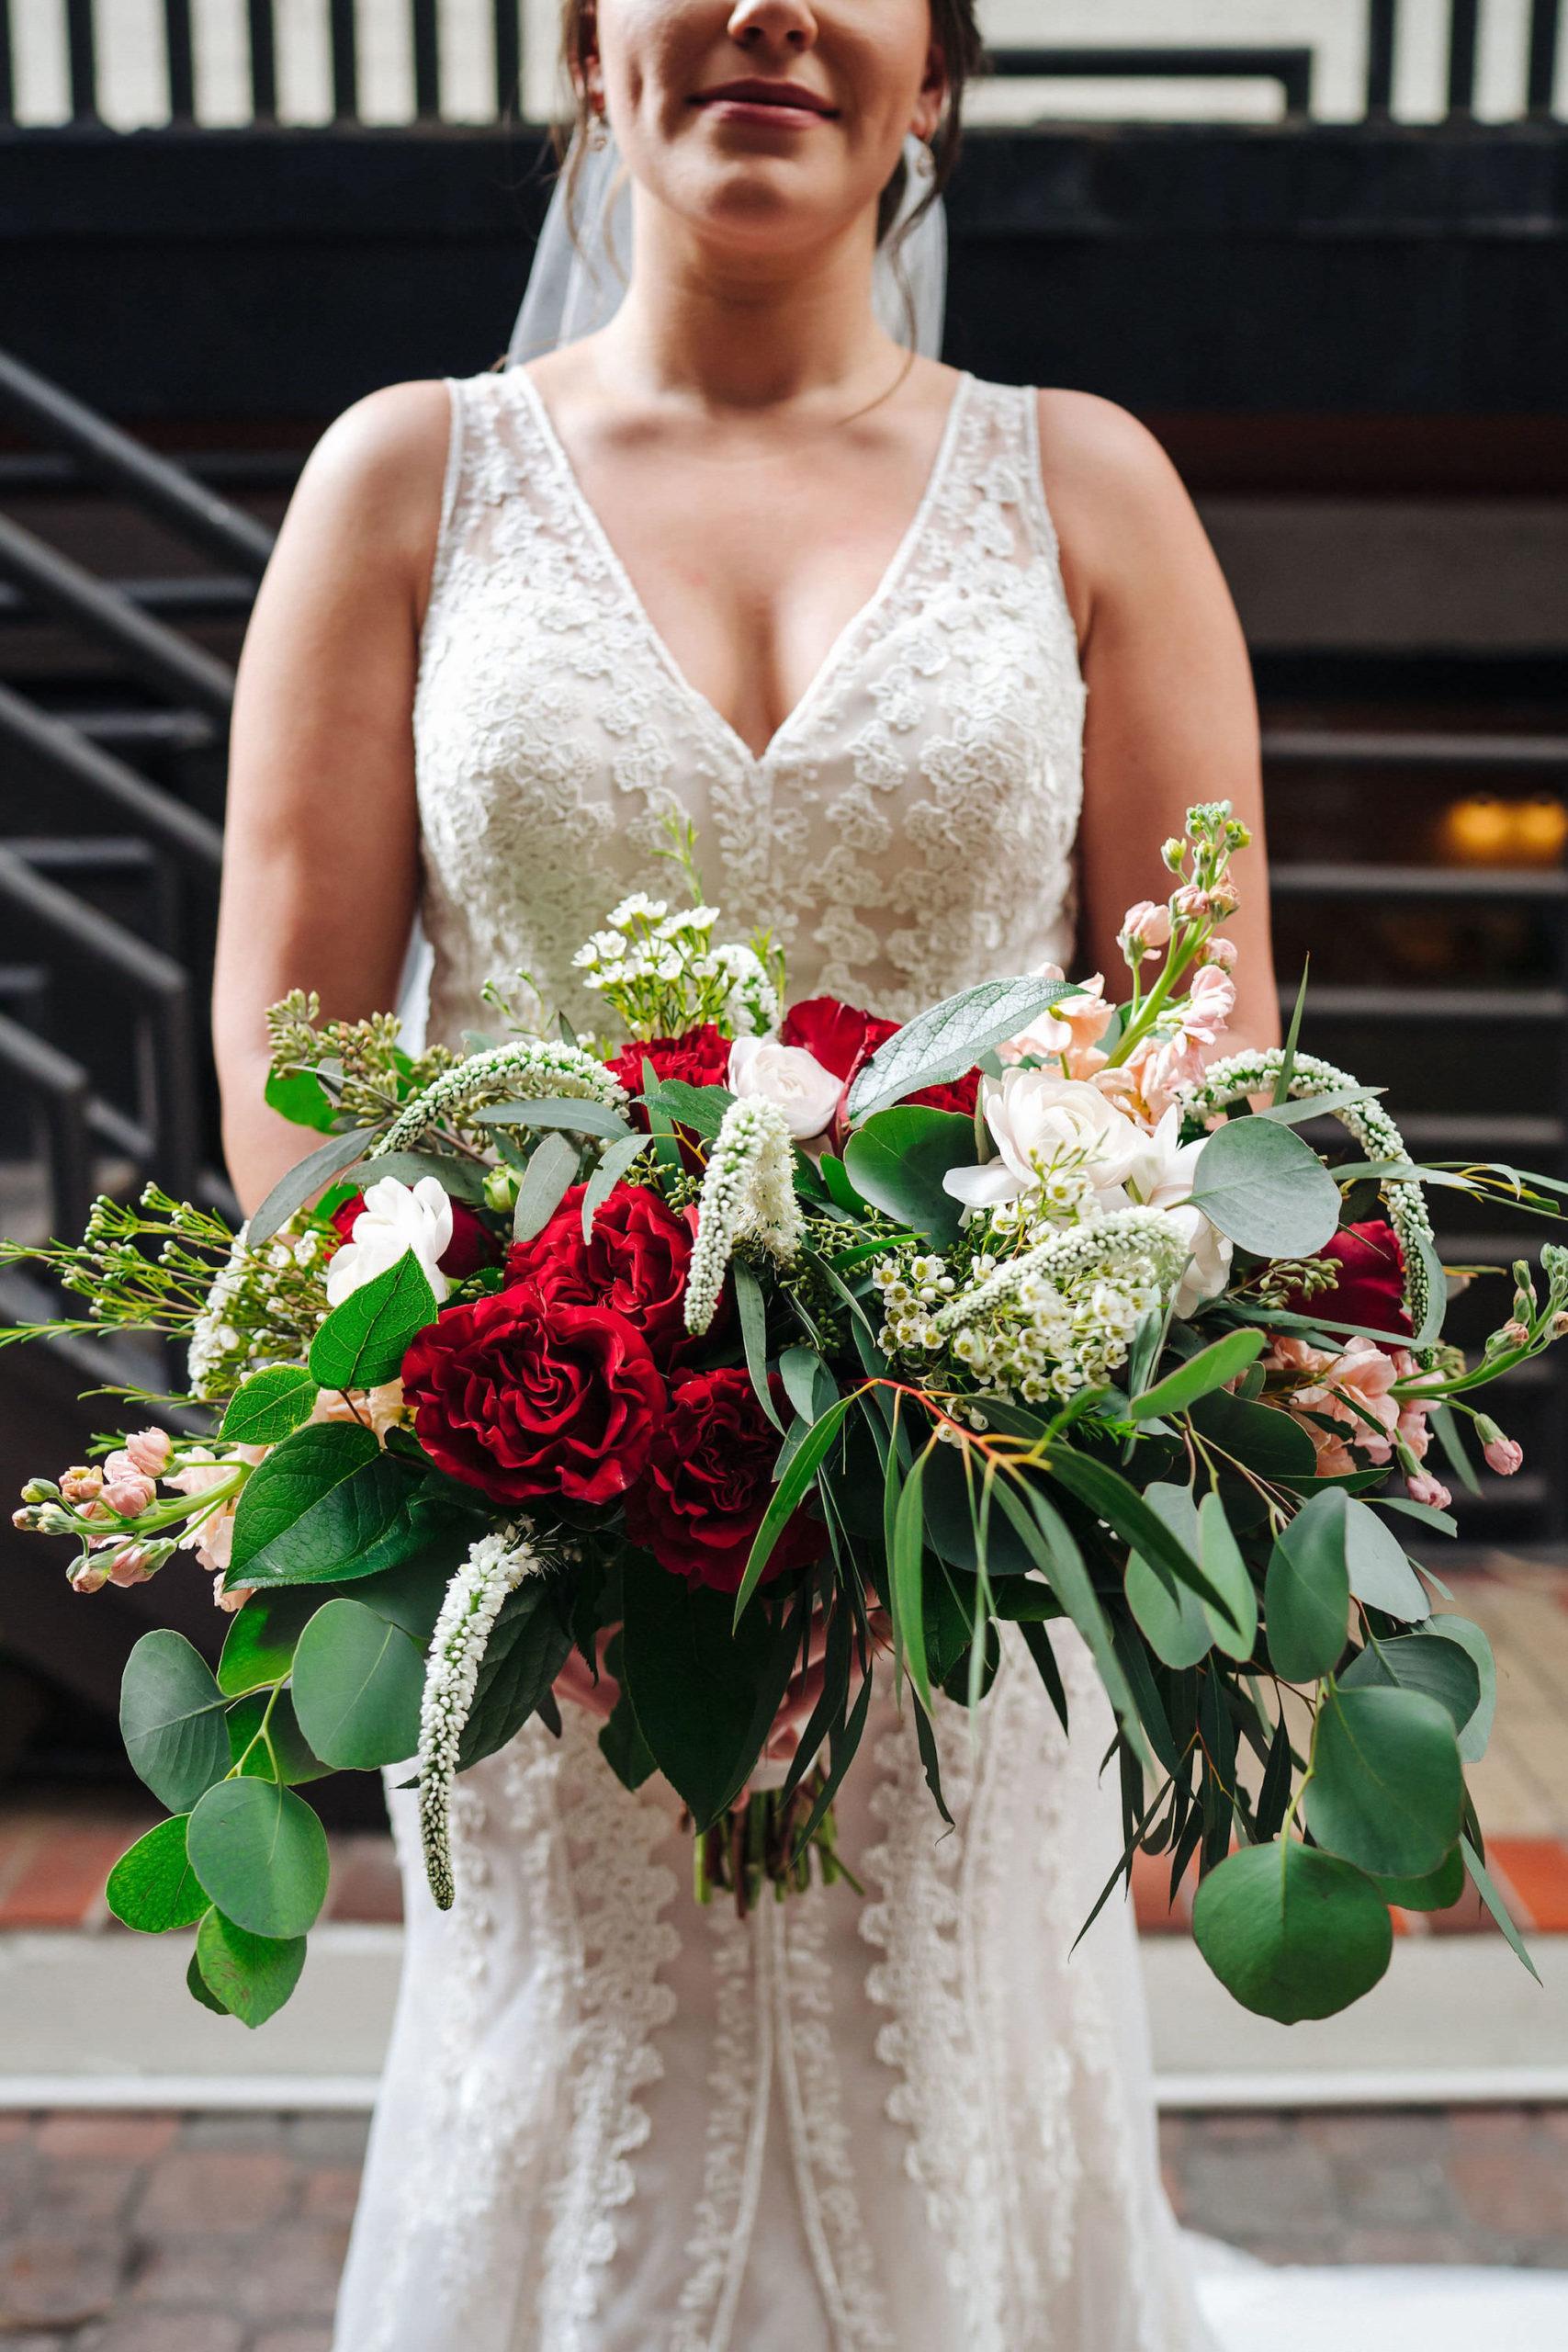 Lace V Neck Bridal Gown   Blush Red Garnet Greenery Boho Natural Bridal Bouquet   St. Pete Wedding